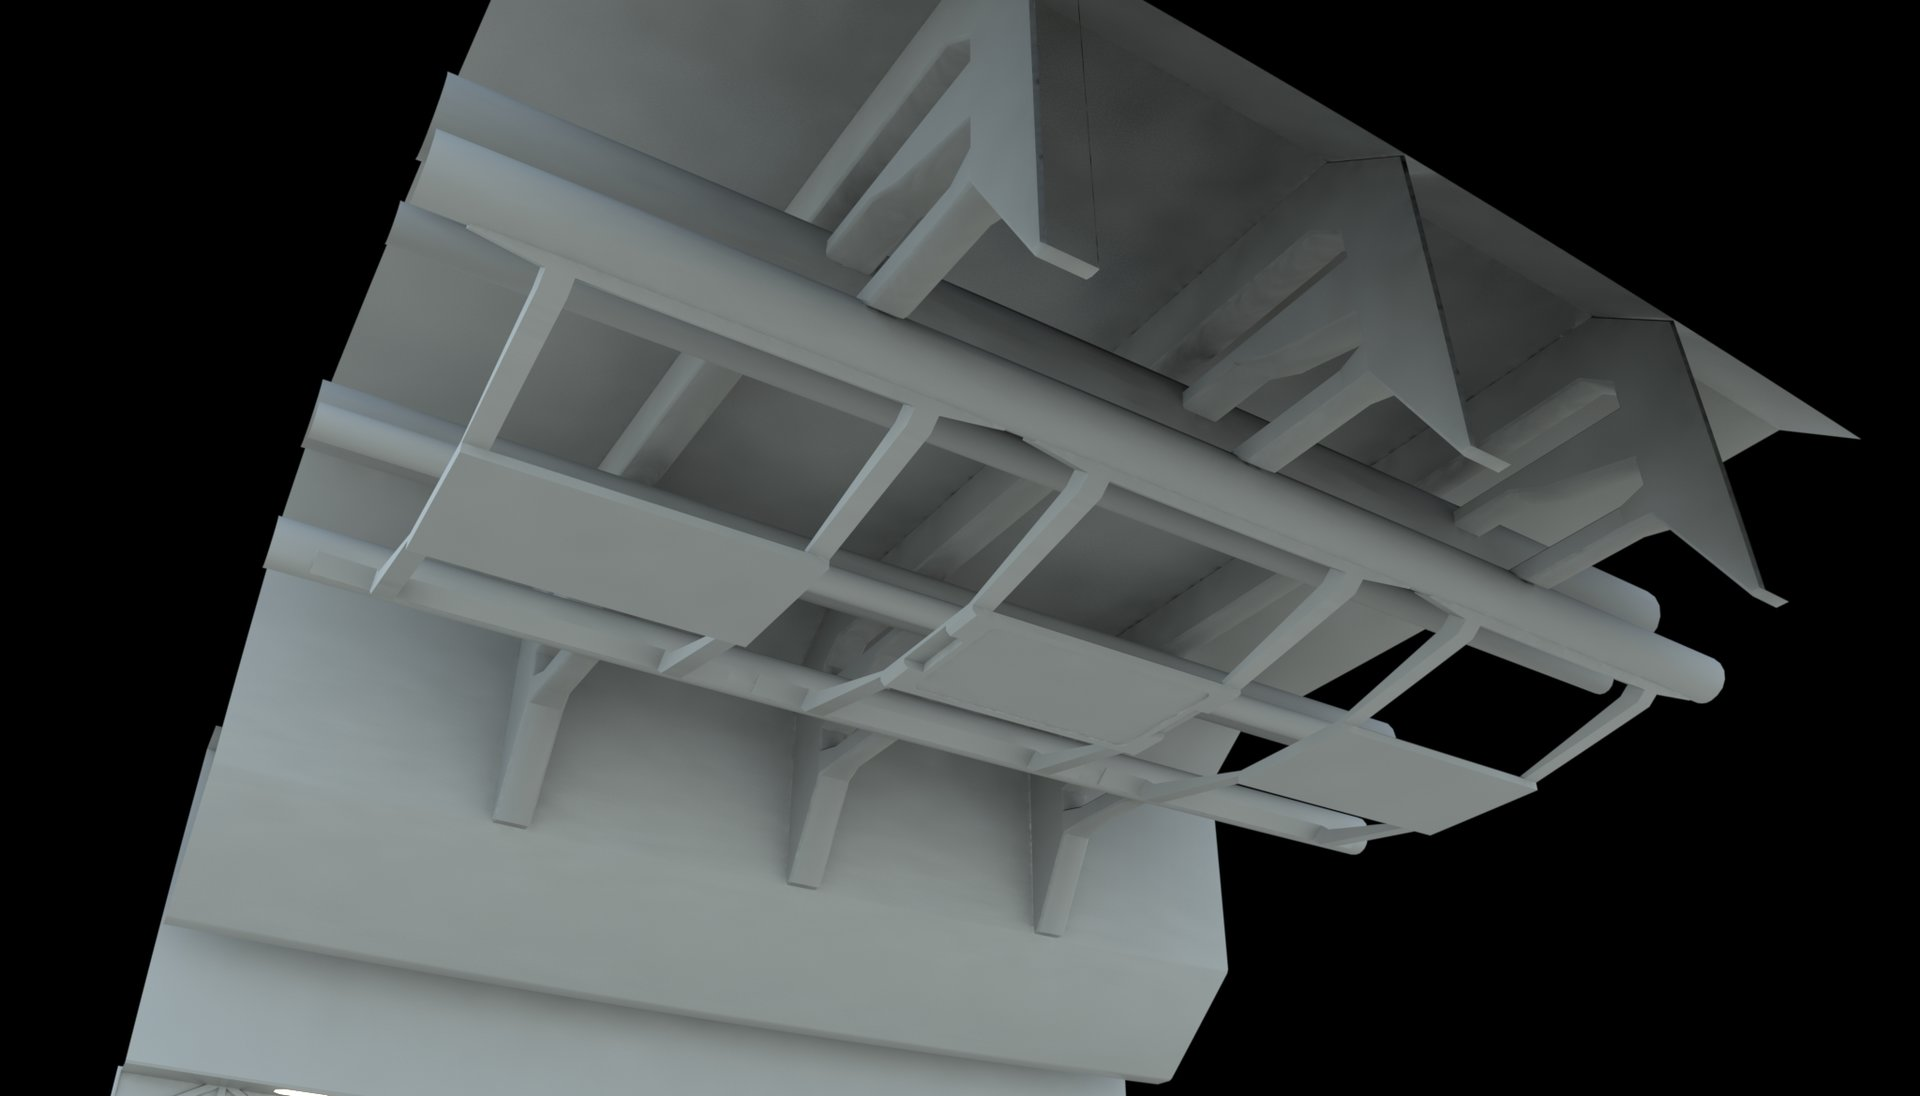 Adrien girod ms ceiling 01